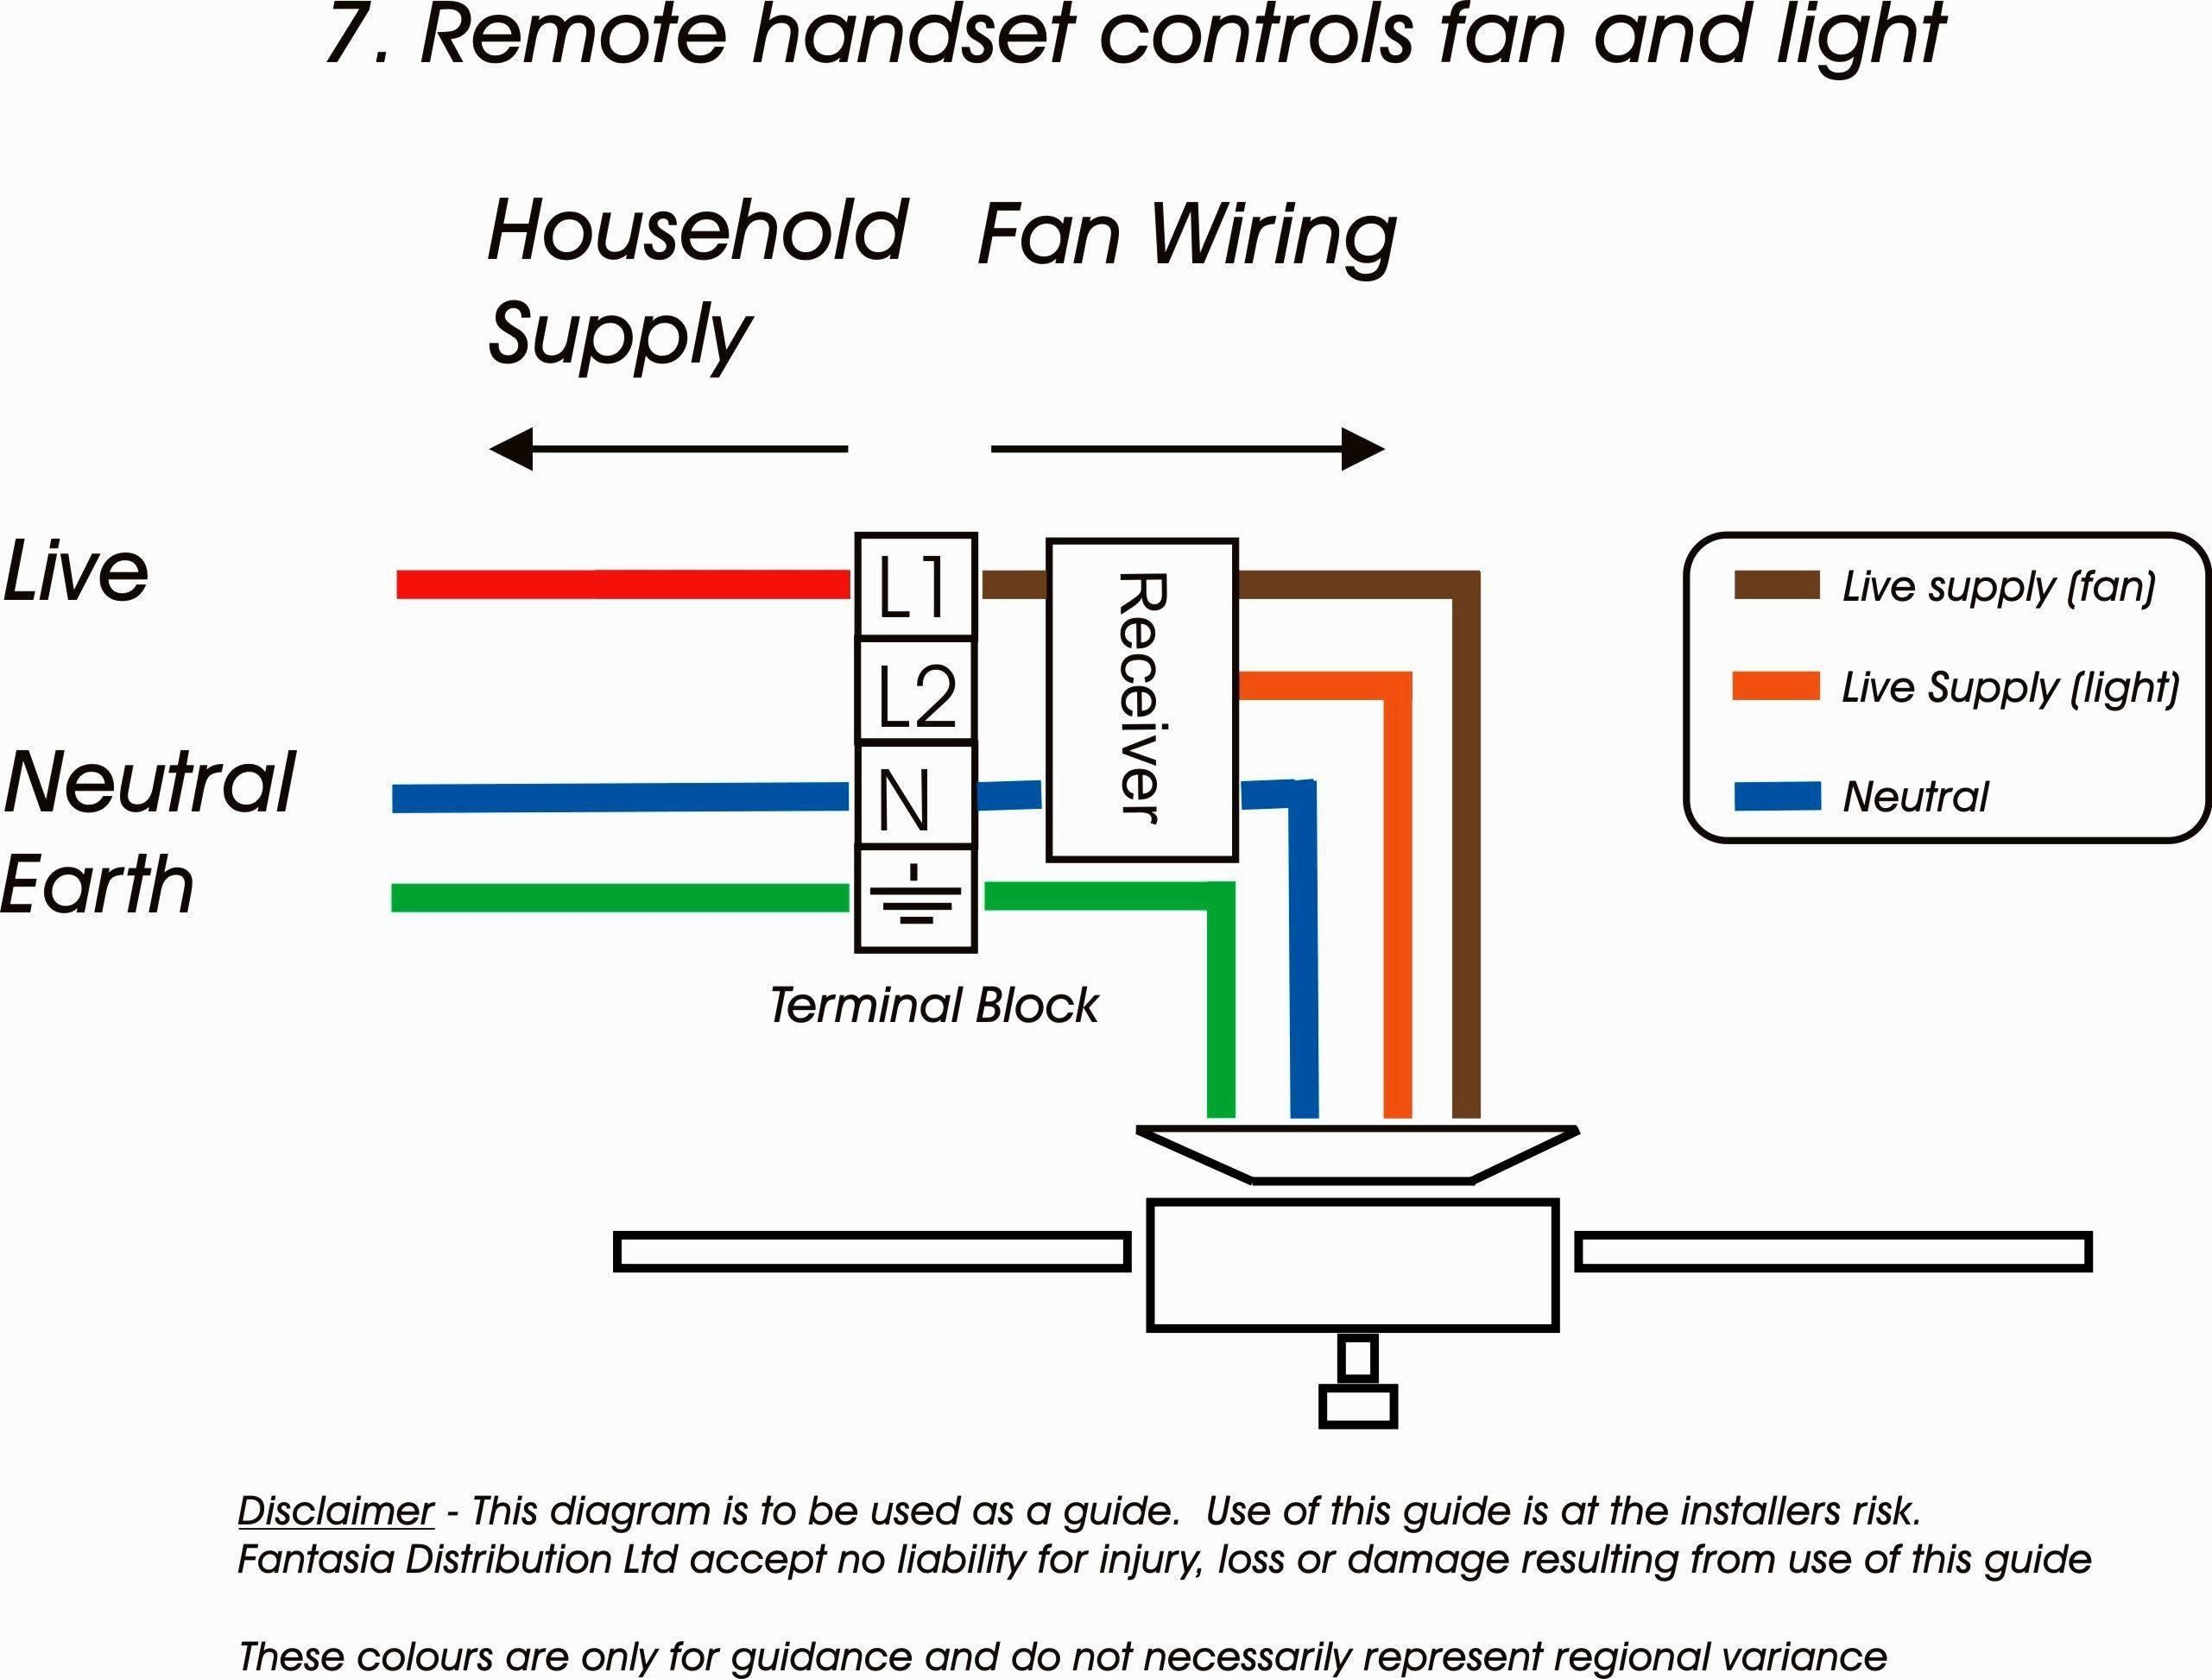 Leviton 3 Way Switch Wiring Diagram Luxury 3 Way Wiring Diagram Diagram Of Leviton 3 Way Switch Wiring Diagram Luxury 3 Way Wiring Diagram Diagram